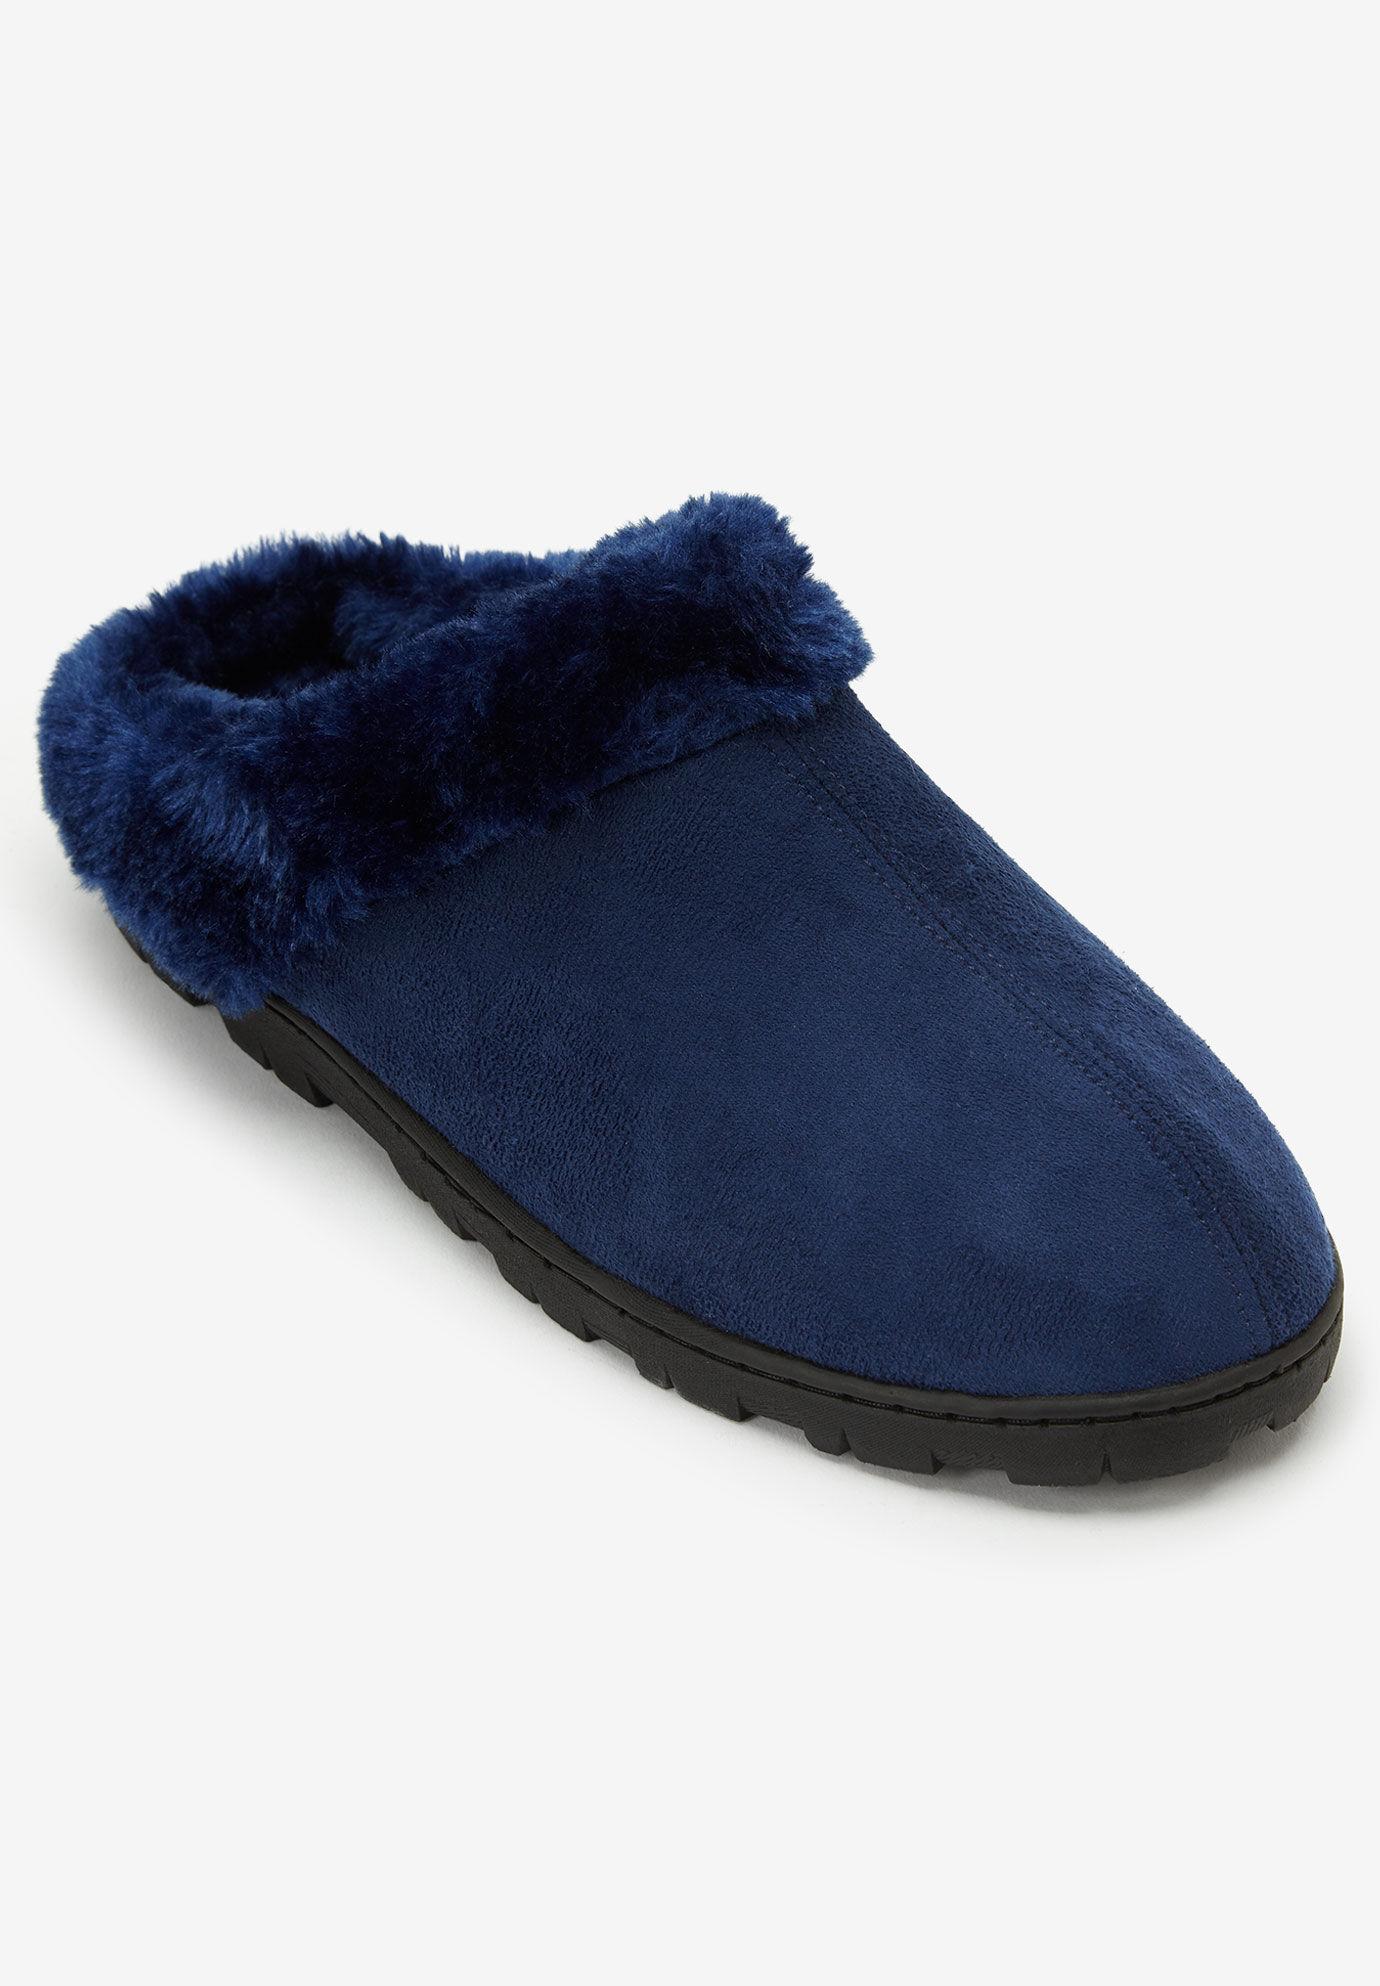 Wide \u0026 Extra Wide Width Slippers